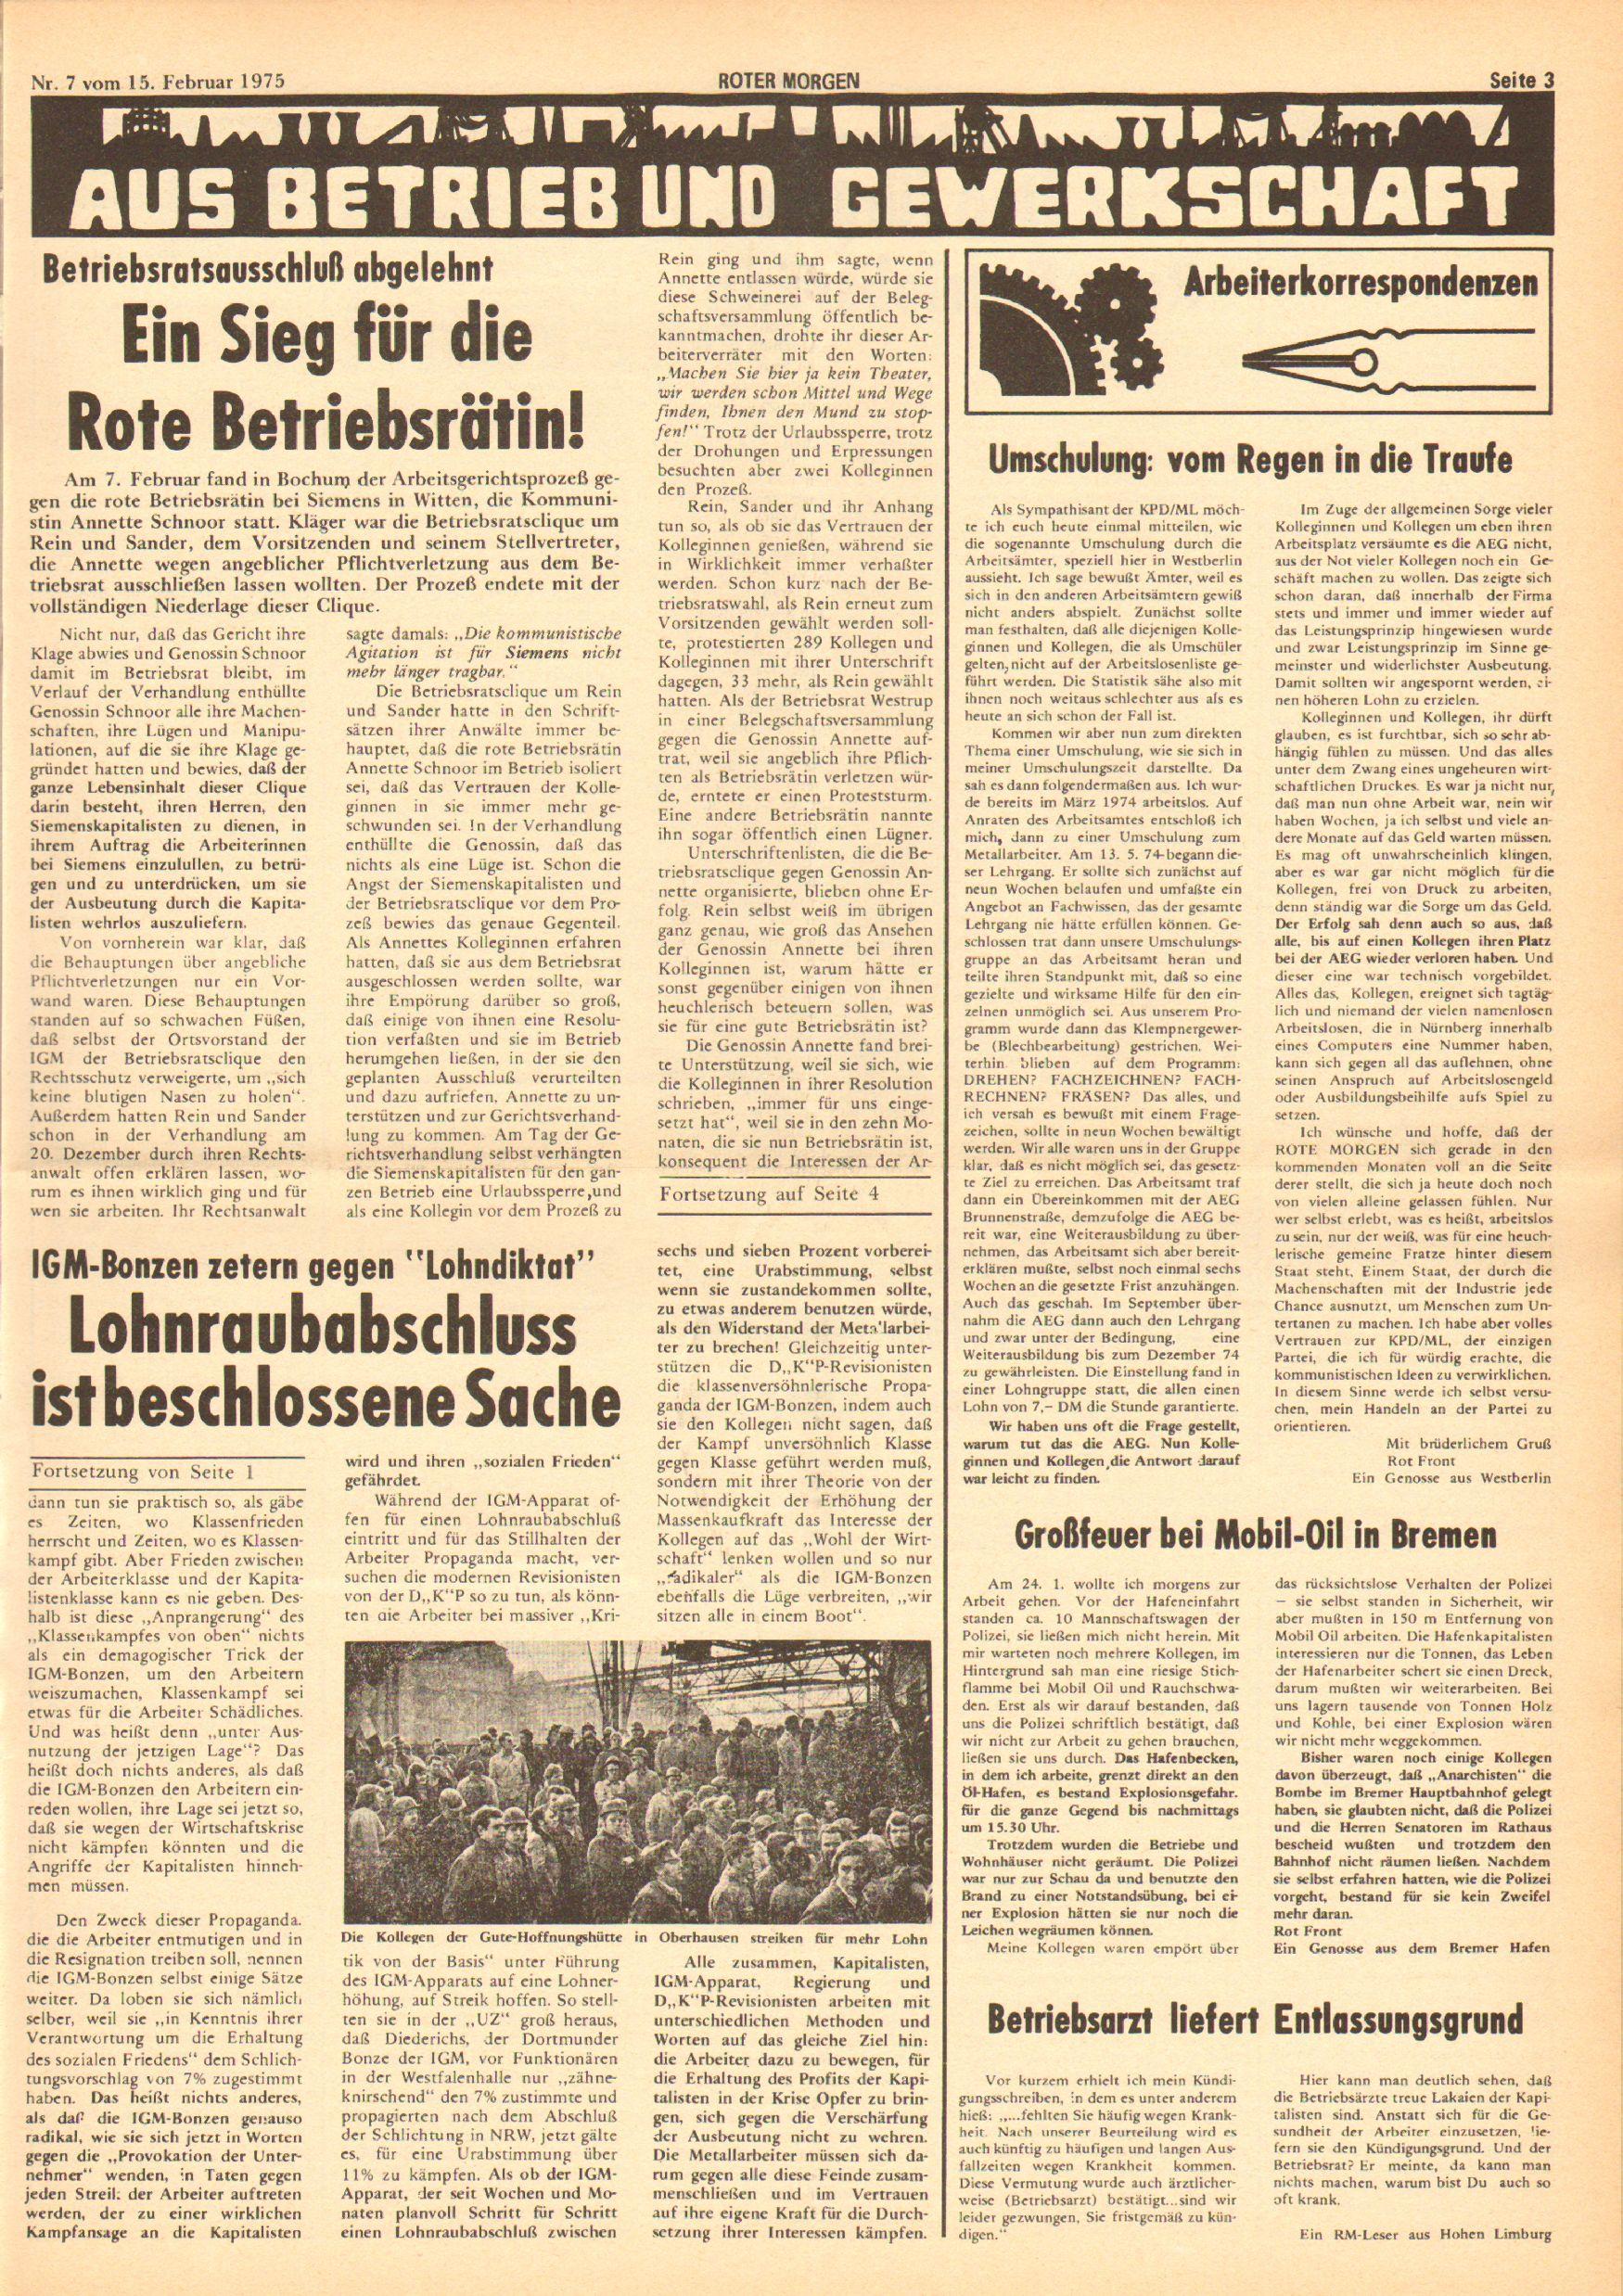 Roter Morgen, 9. Jg., 15. Februar 1975, Nr. 7, Seite 3